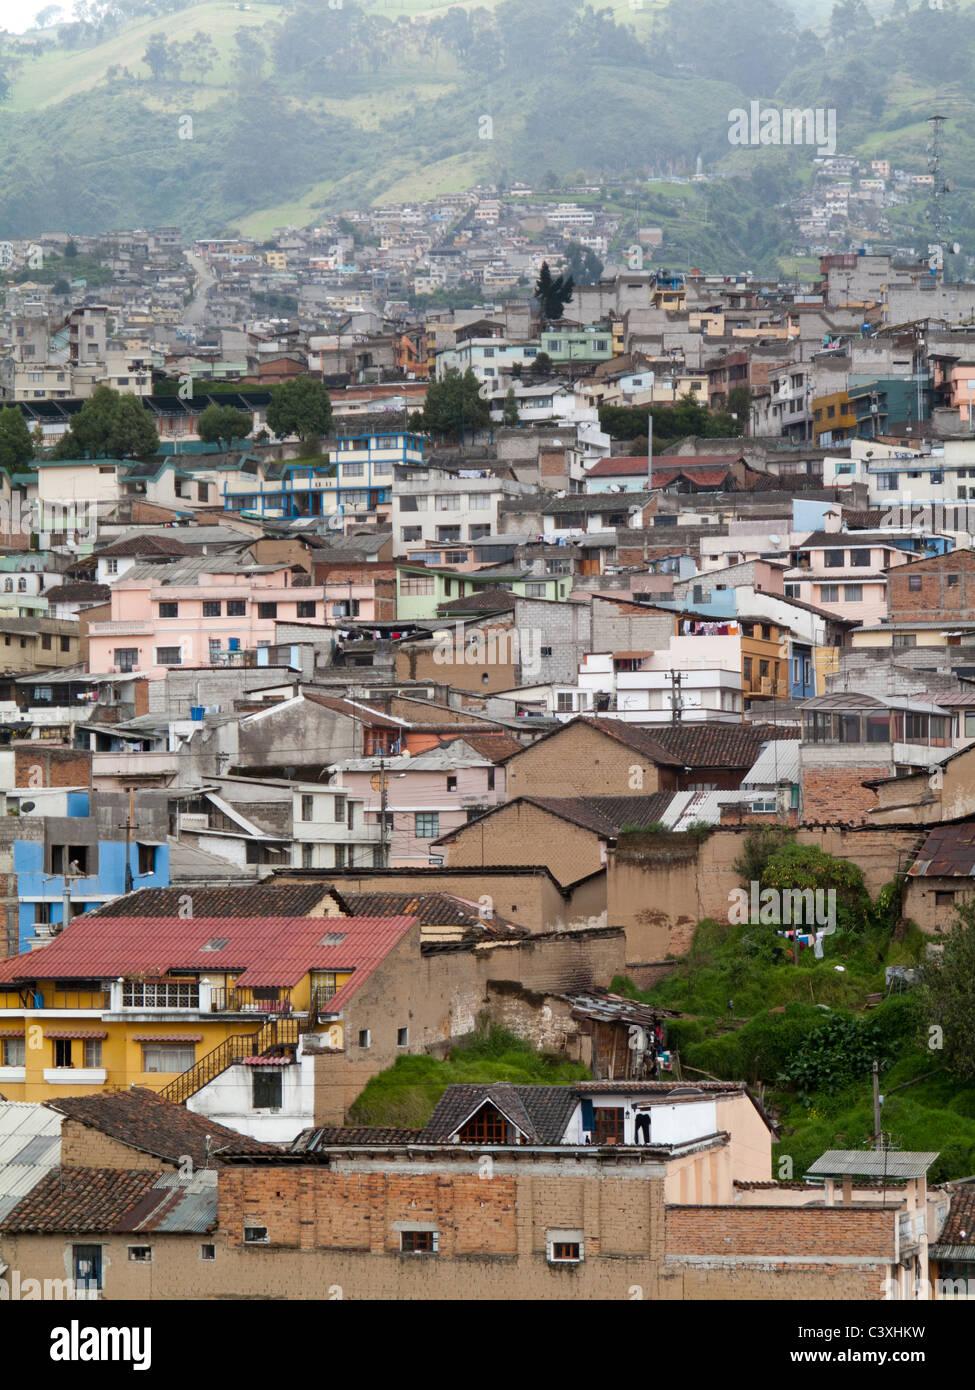 view of Quito, Ecuador - Stock Image